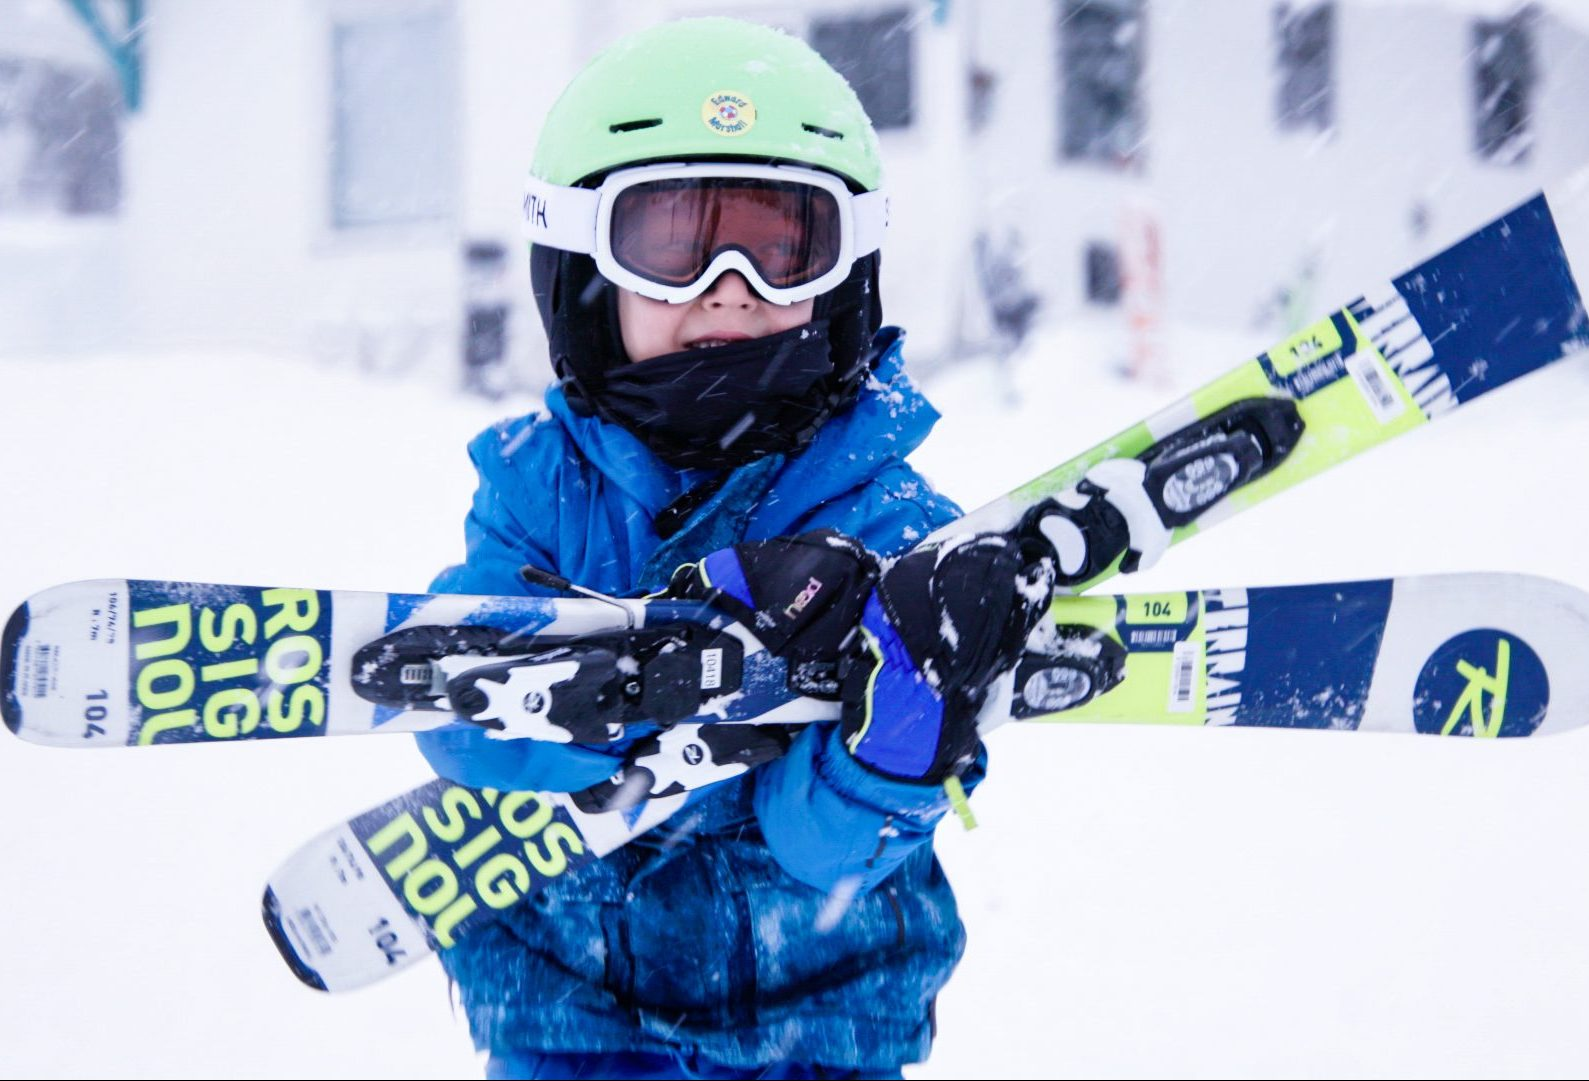 child carrying skis at Sasquatch Mountain Resort